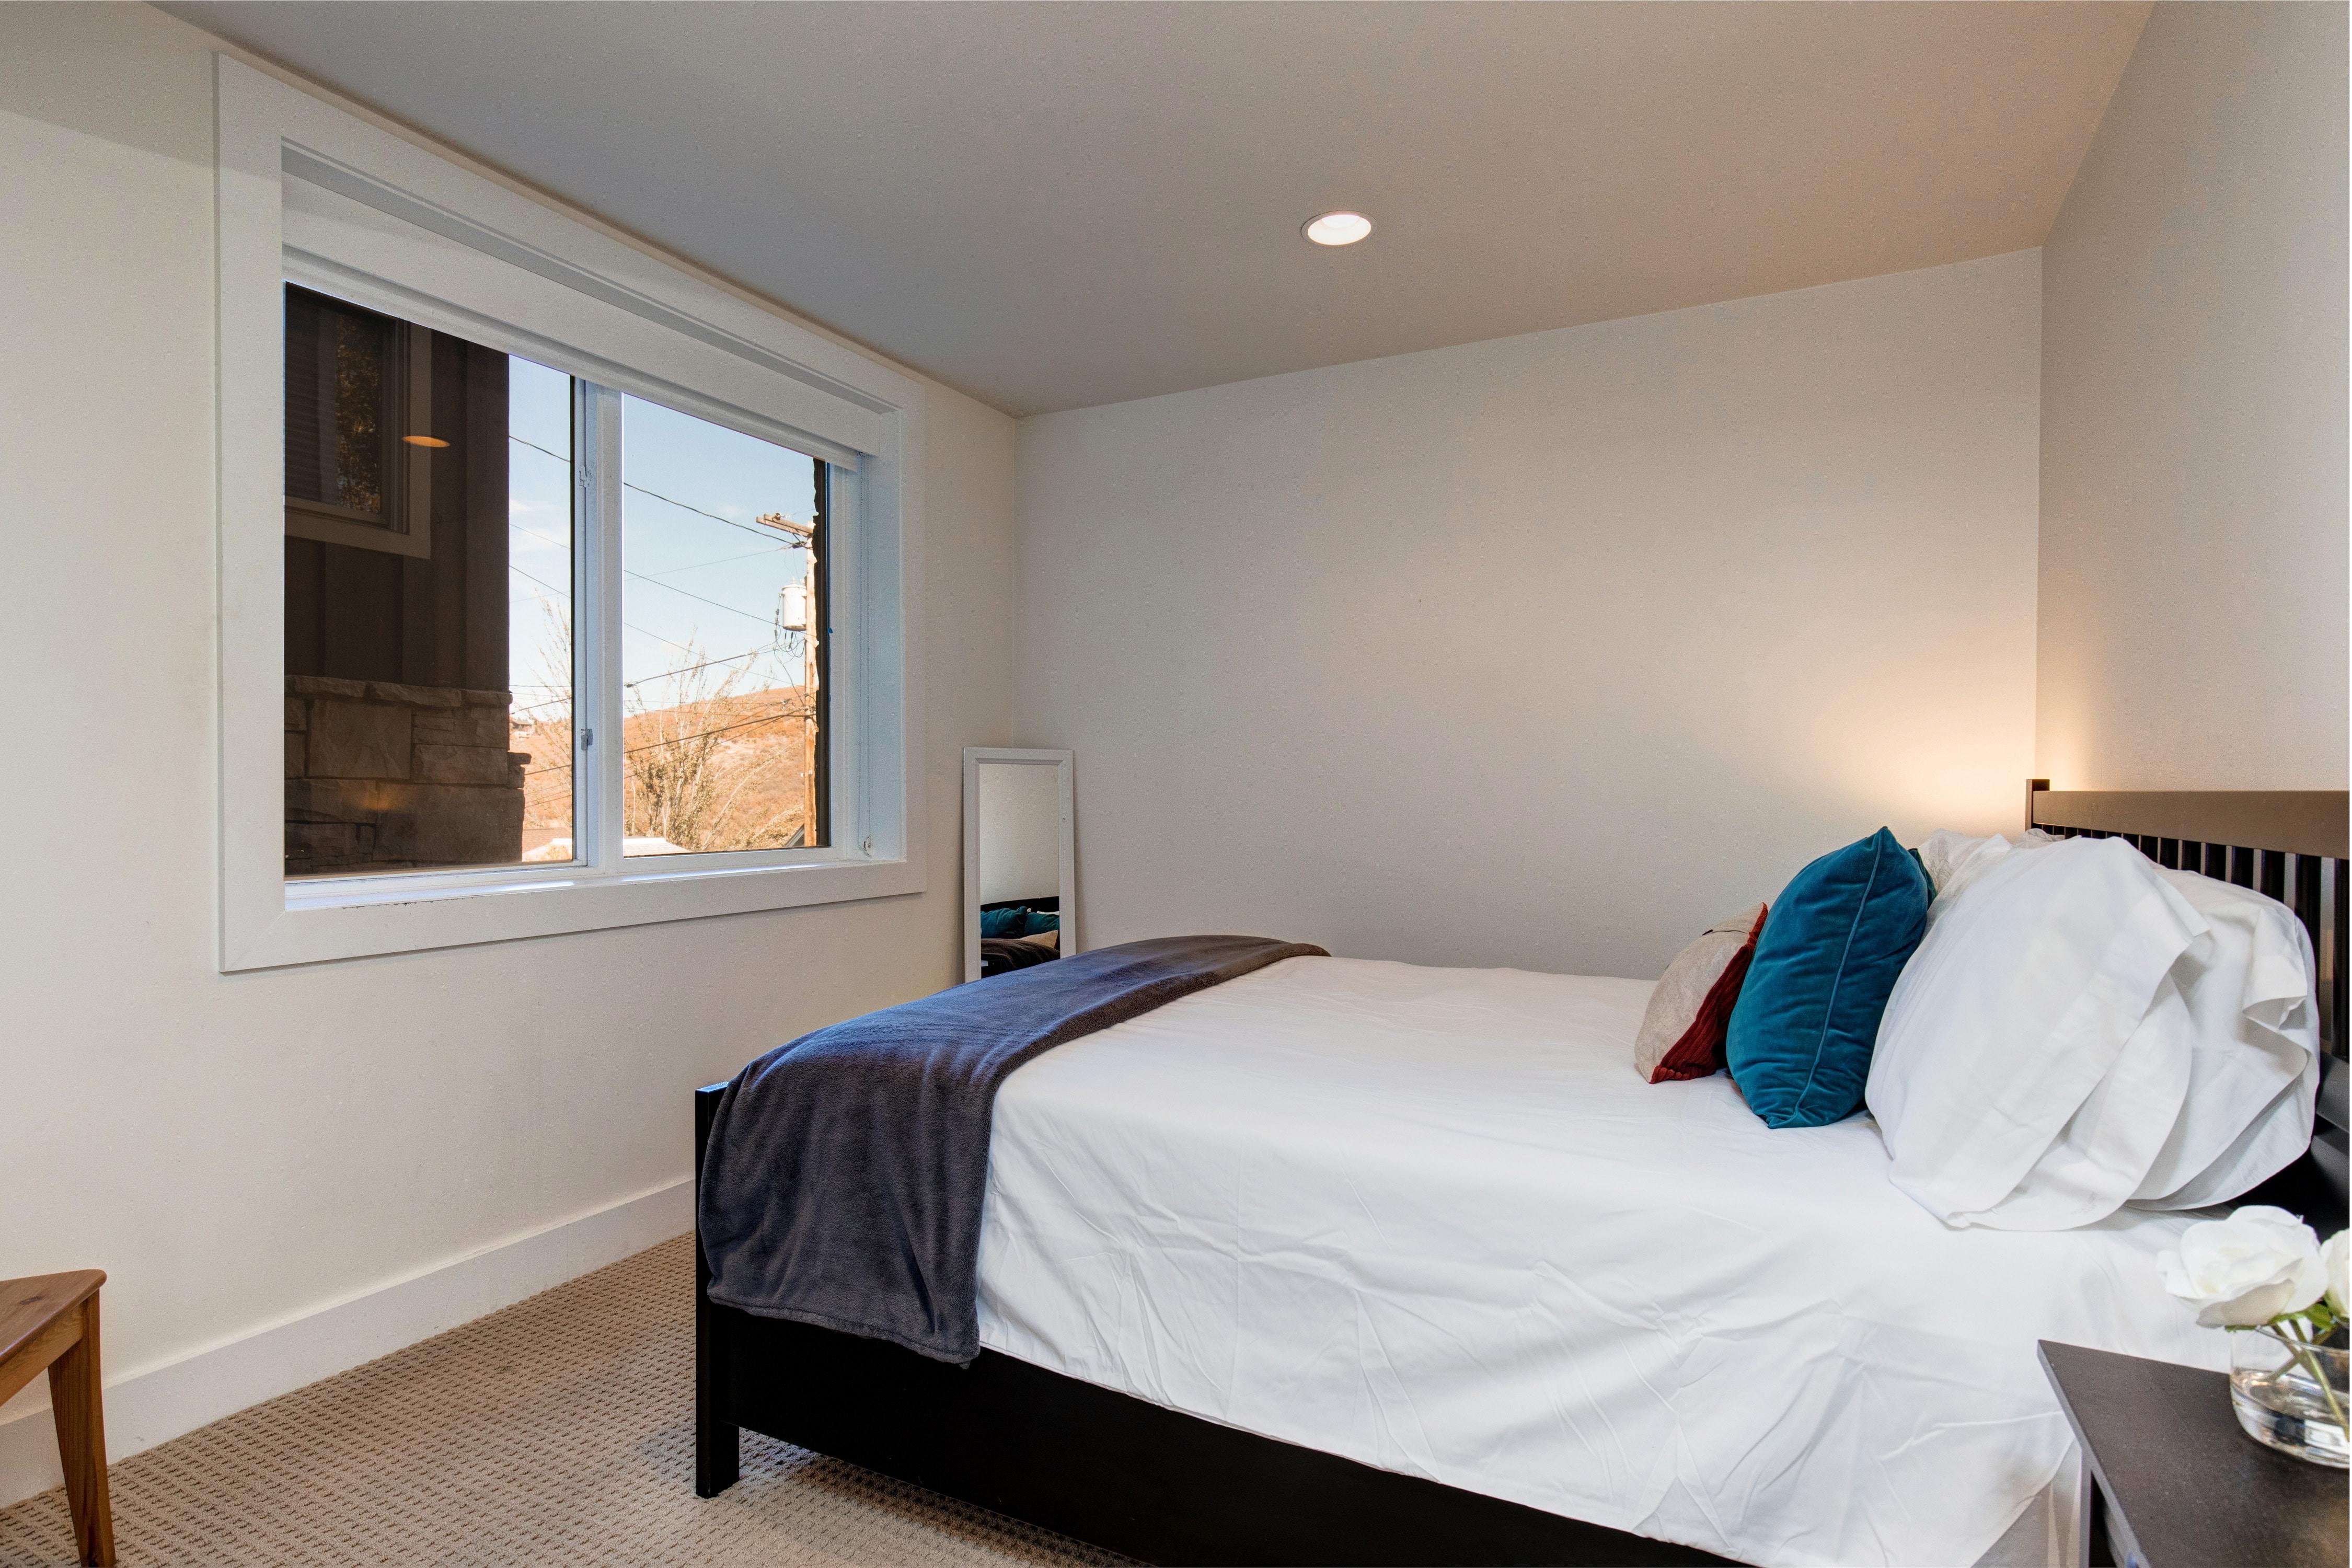 bedroom queen hinsdale house rental | Abode-Luxury-Rentals-Park-City-Utah-Hillside-Interior ...